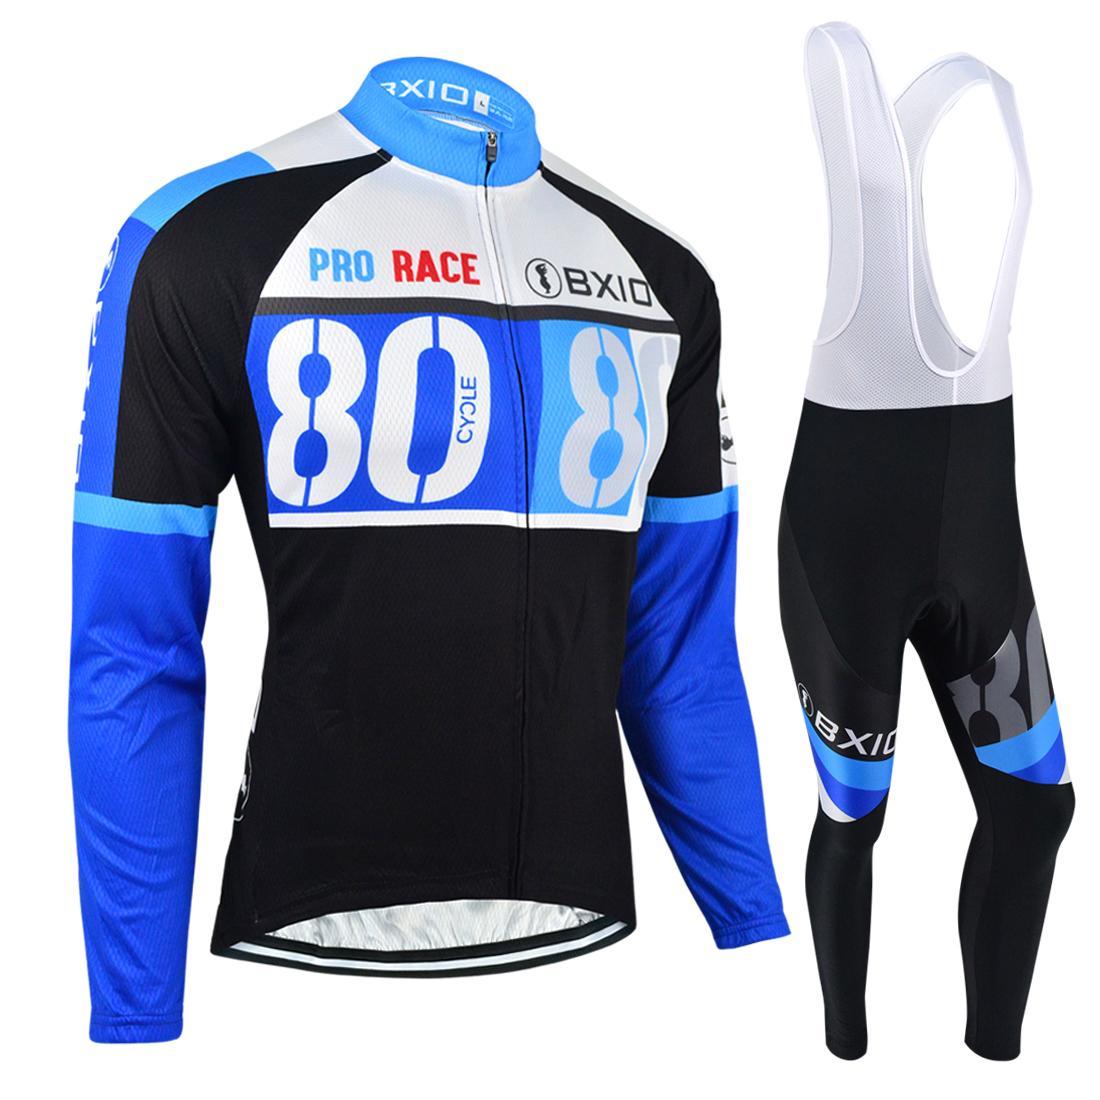 BXIO Brand Winter Thermal Cycling Jerseys Anti Pilling Cycle Jersey ... 7e425bcb3